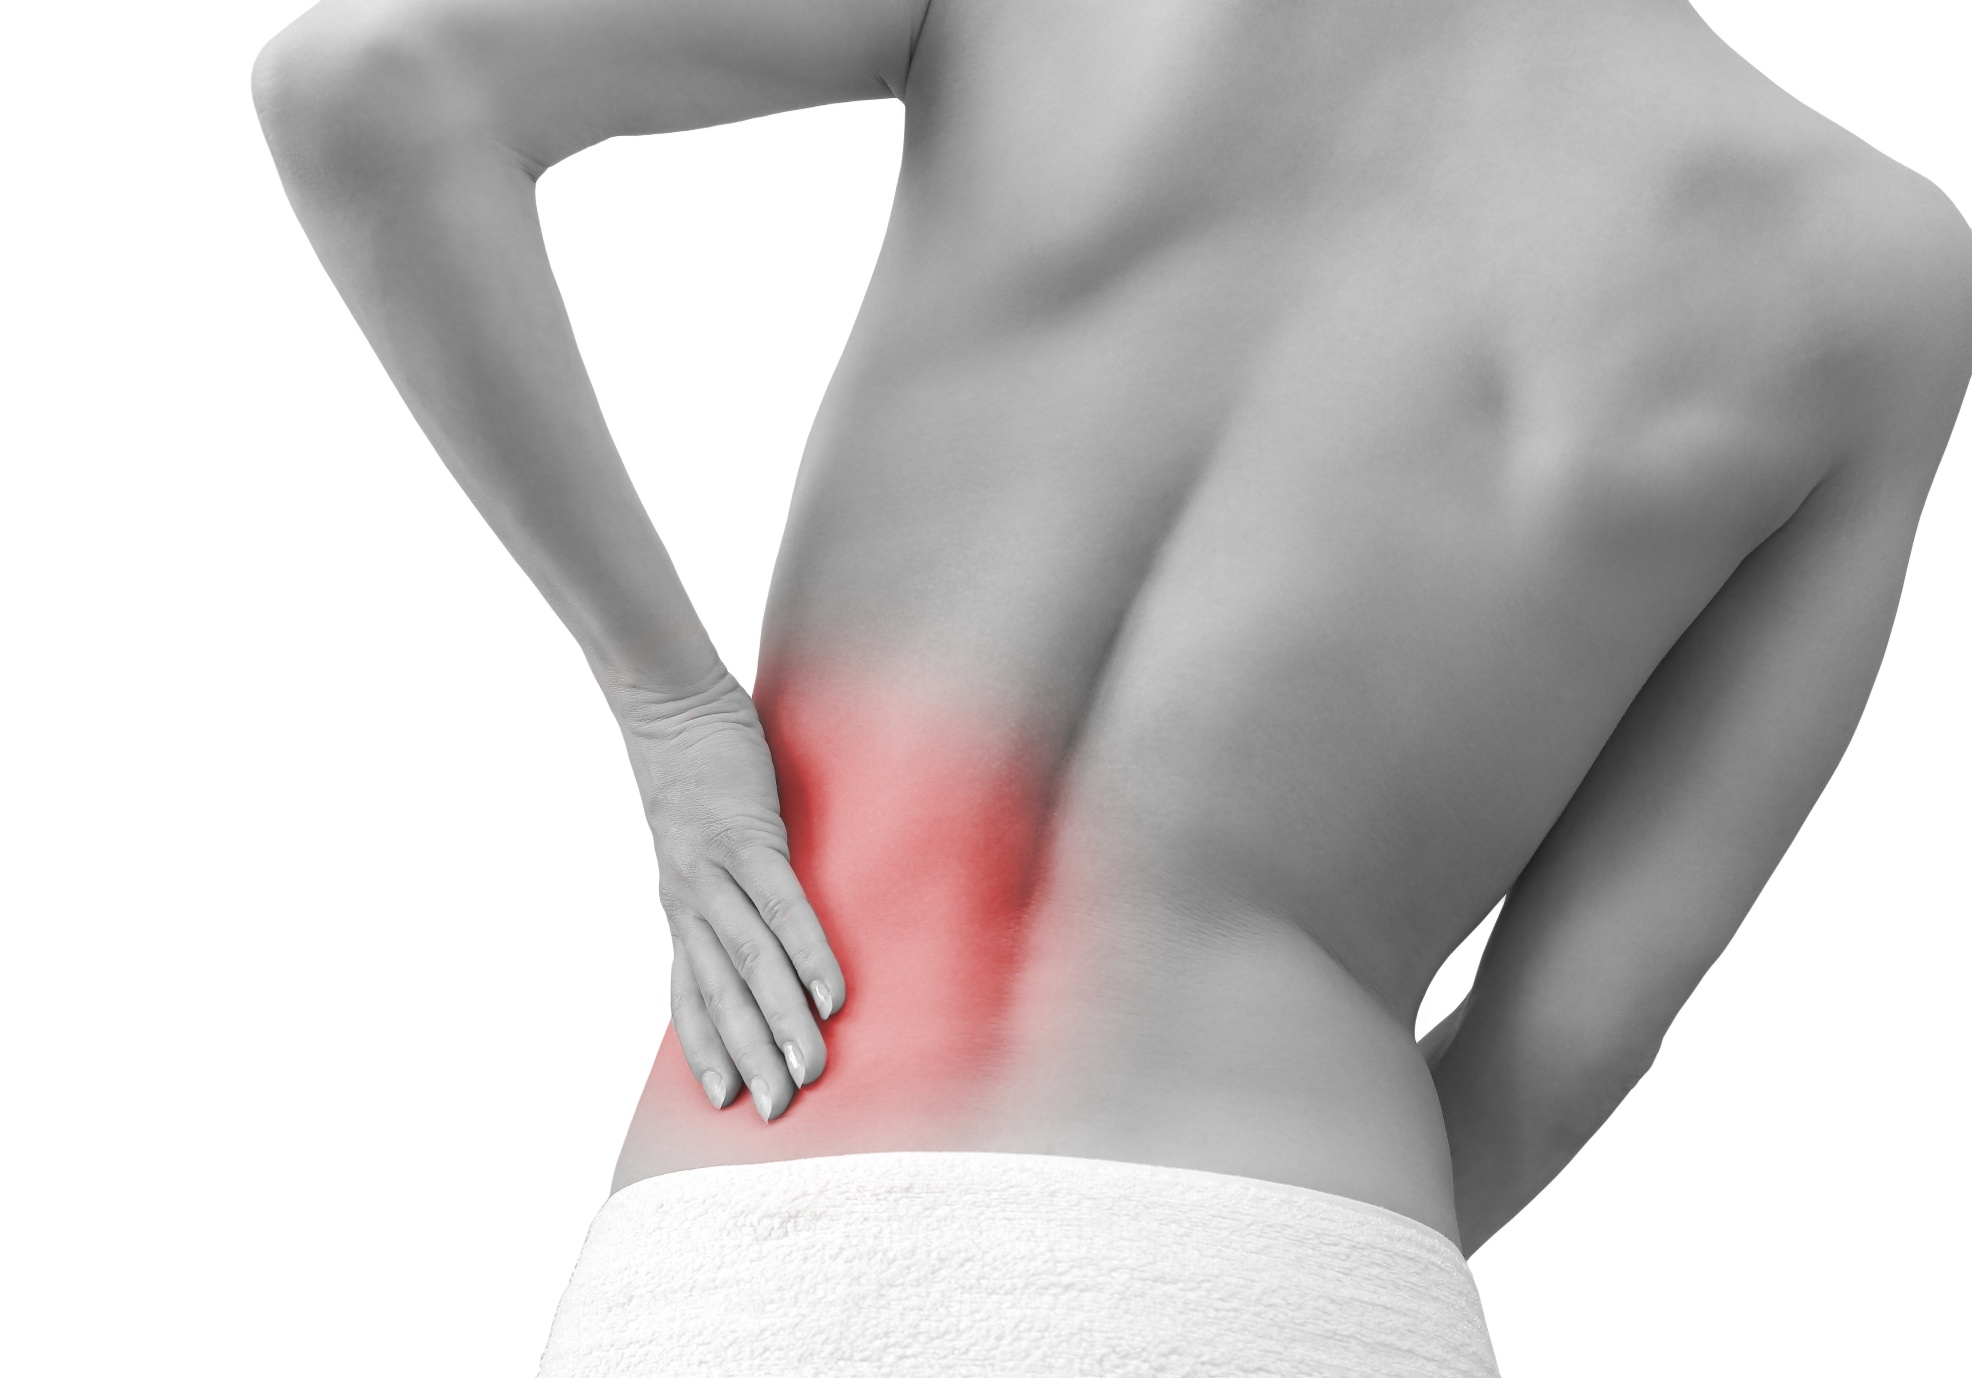 Unos 60 millones de latinoamericanos son afectados por dolor lumbar crónico